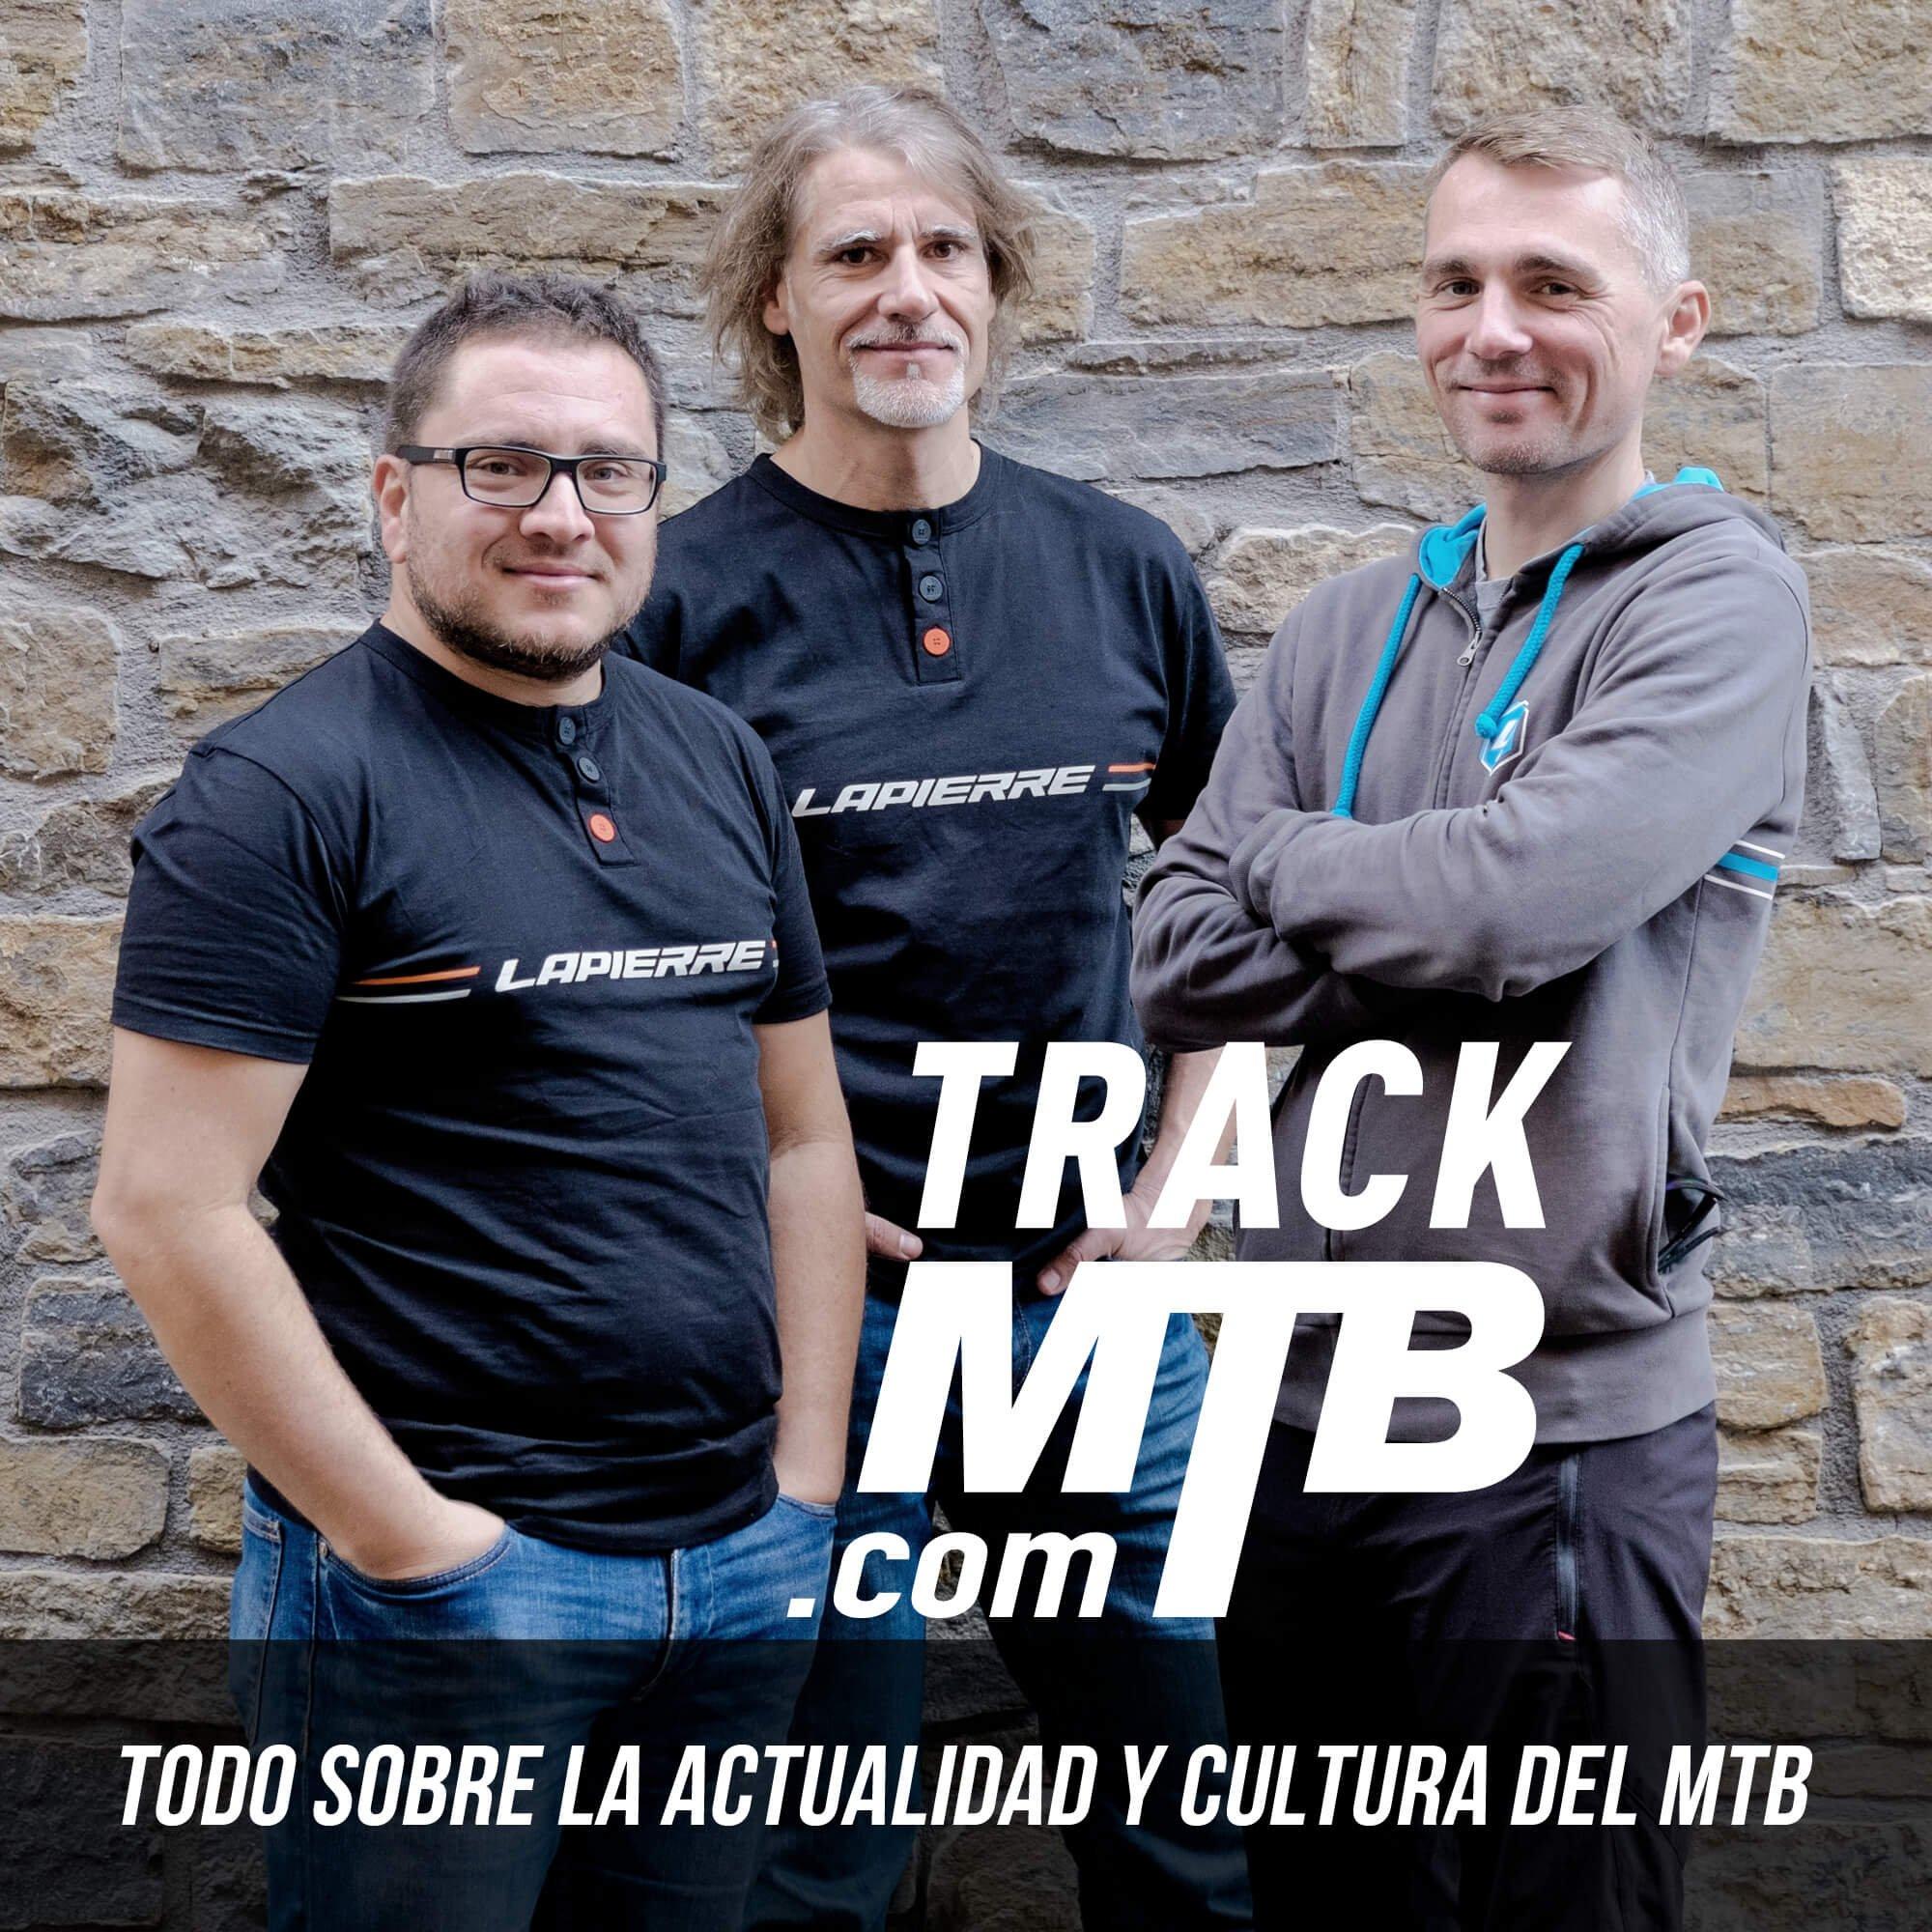 Ep 60 Joana Monteiro Nos Desnuda Test Productos Mrp Track Mtb